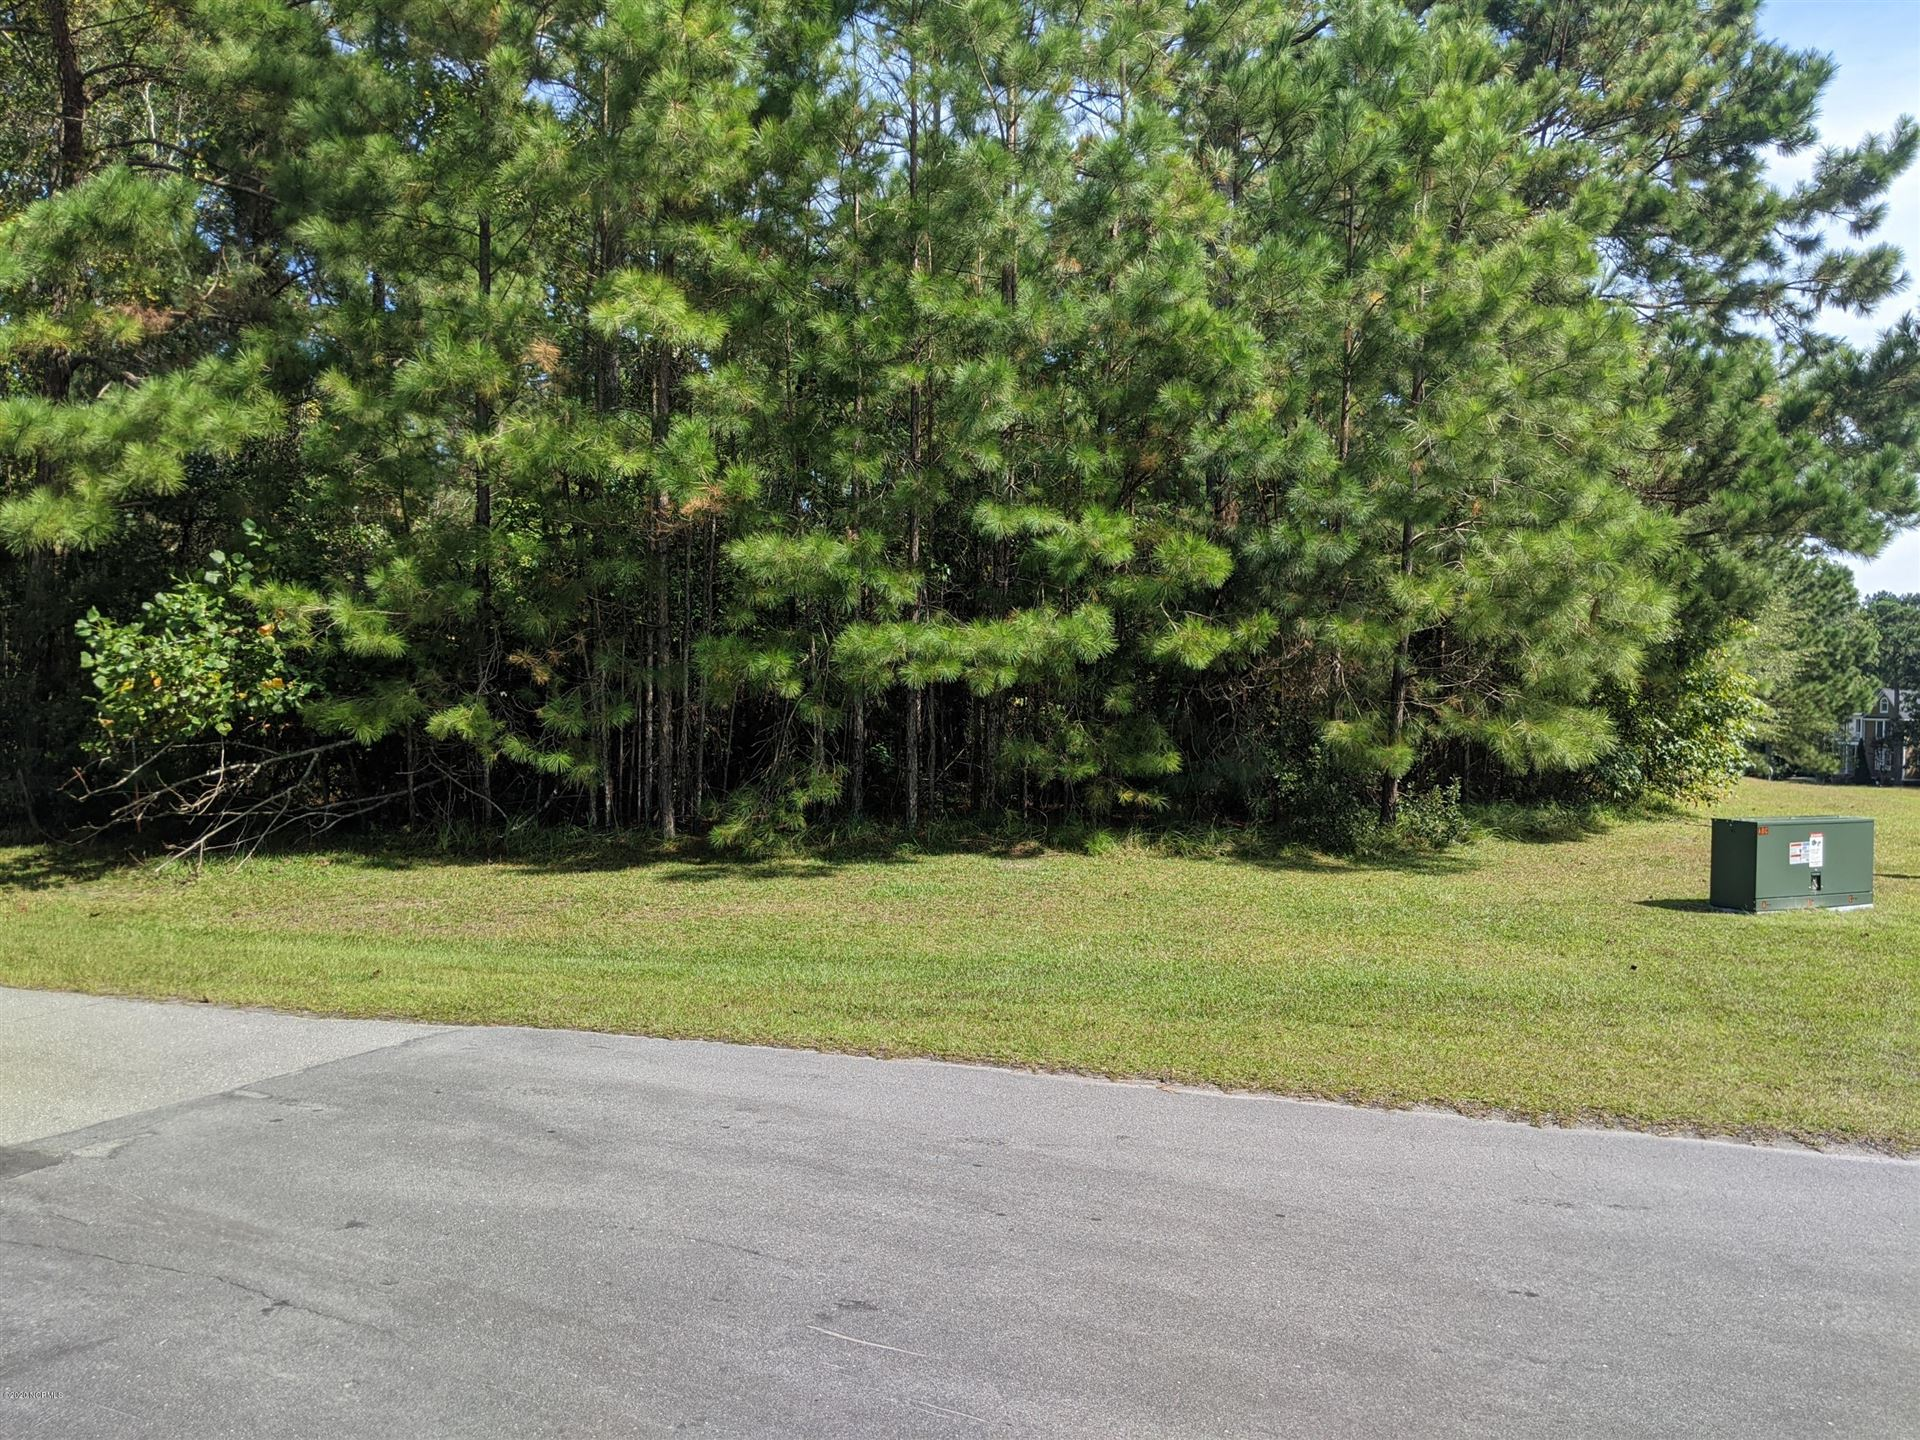 Photo of 100 Line Boat Lane, Swansboro, NC 28584 (MLS # 100239481)